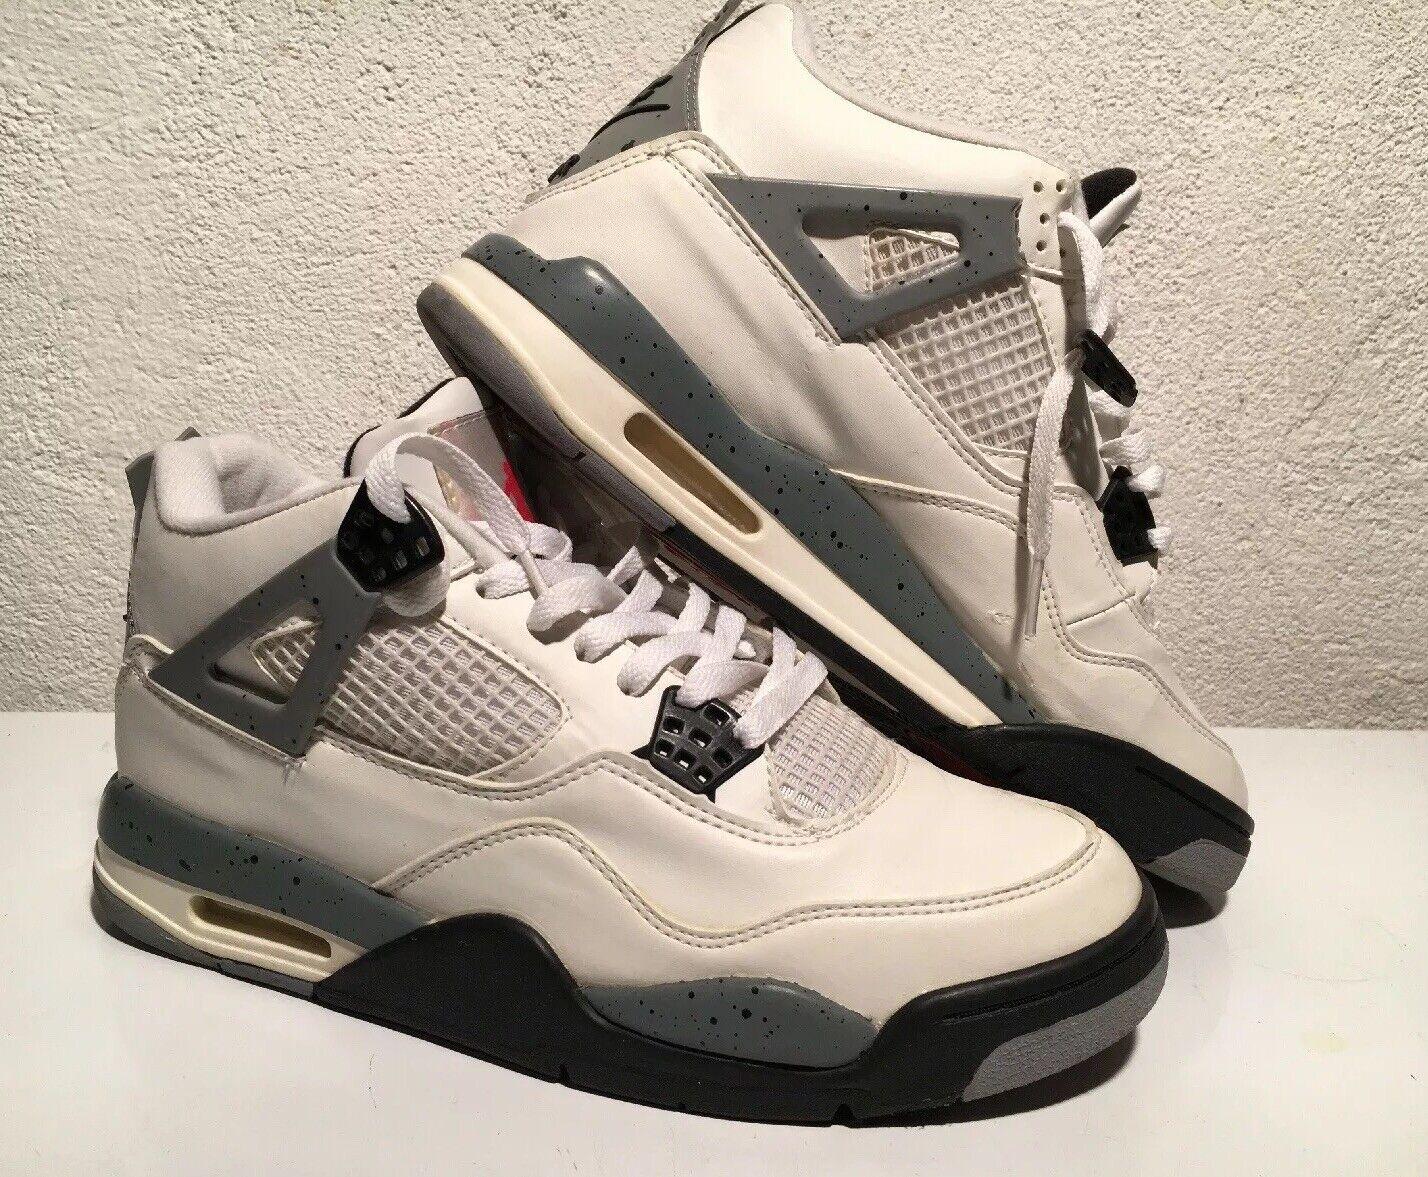 new product 784ee 1d96c 1999 Nike Air Jordan Retro IV White White White Cement 136013 101 Size 10  Black Grey